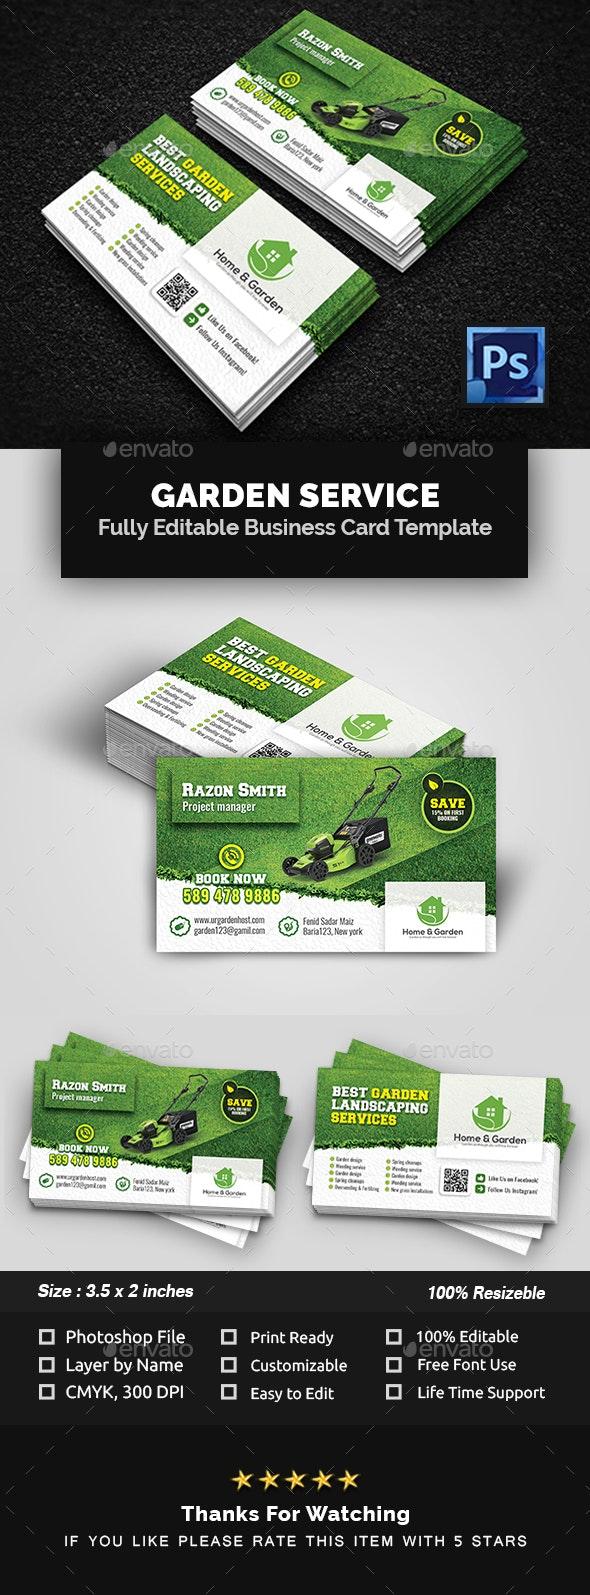 Garden Landscape Business Card Template - Business Cards Print Templates